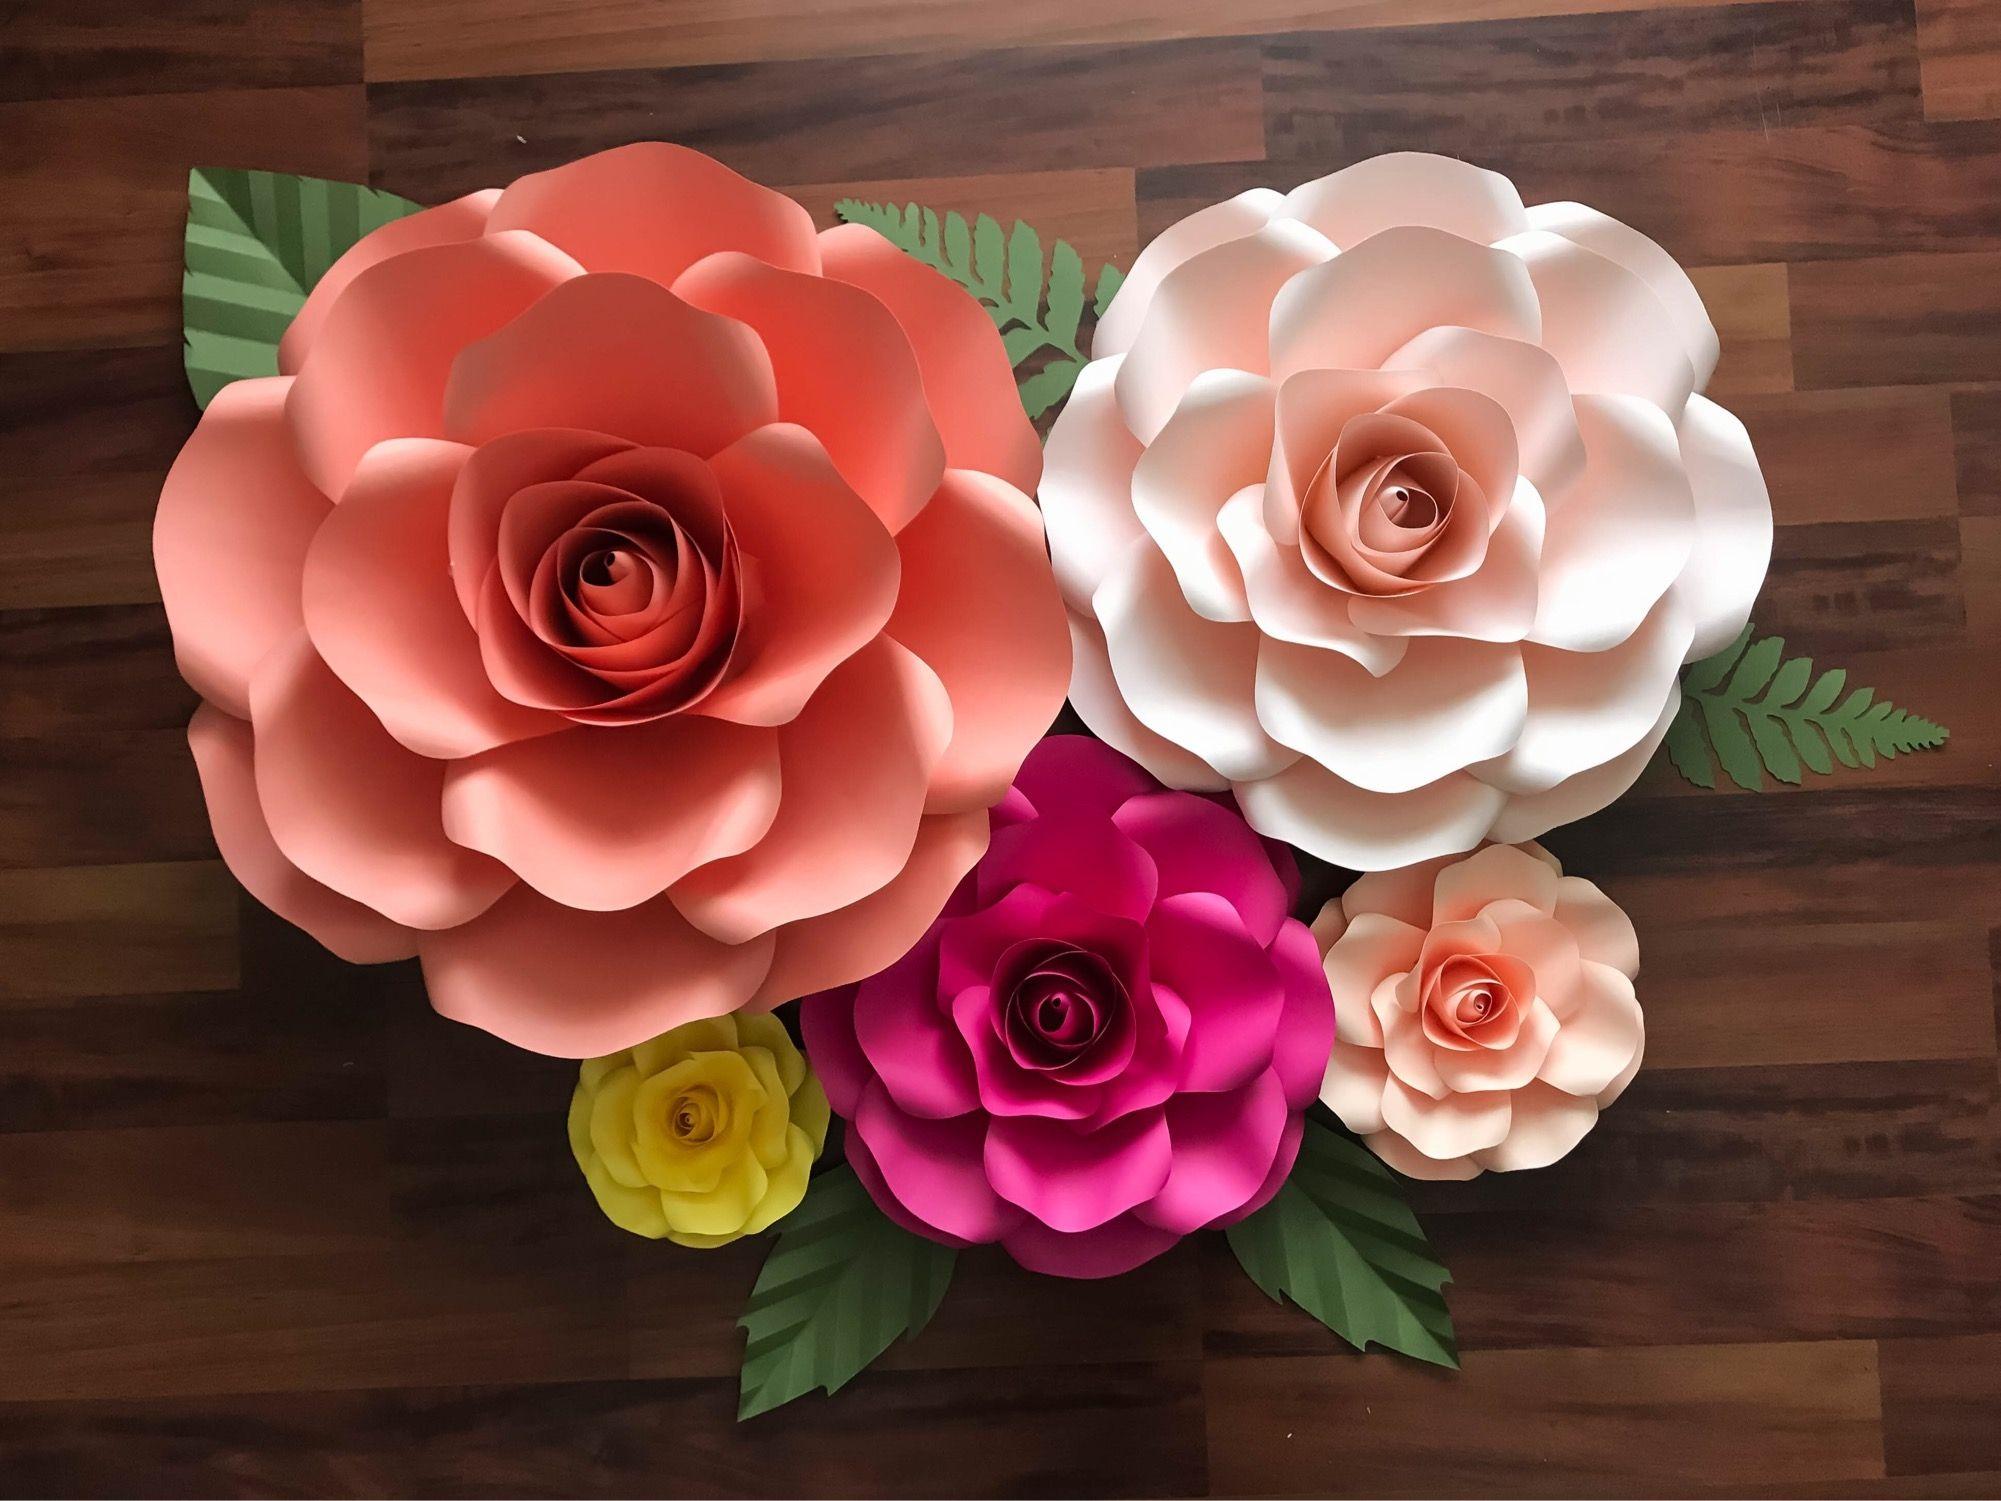 Thecraftysag Svg Extra Large Rose Paper Flower Template Diy